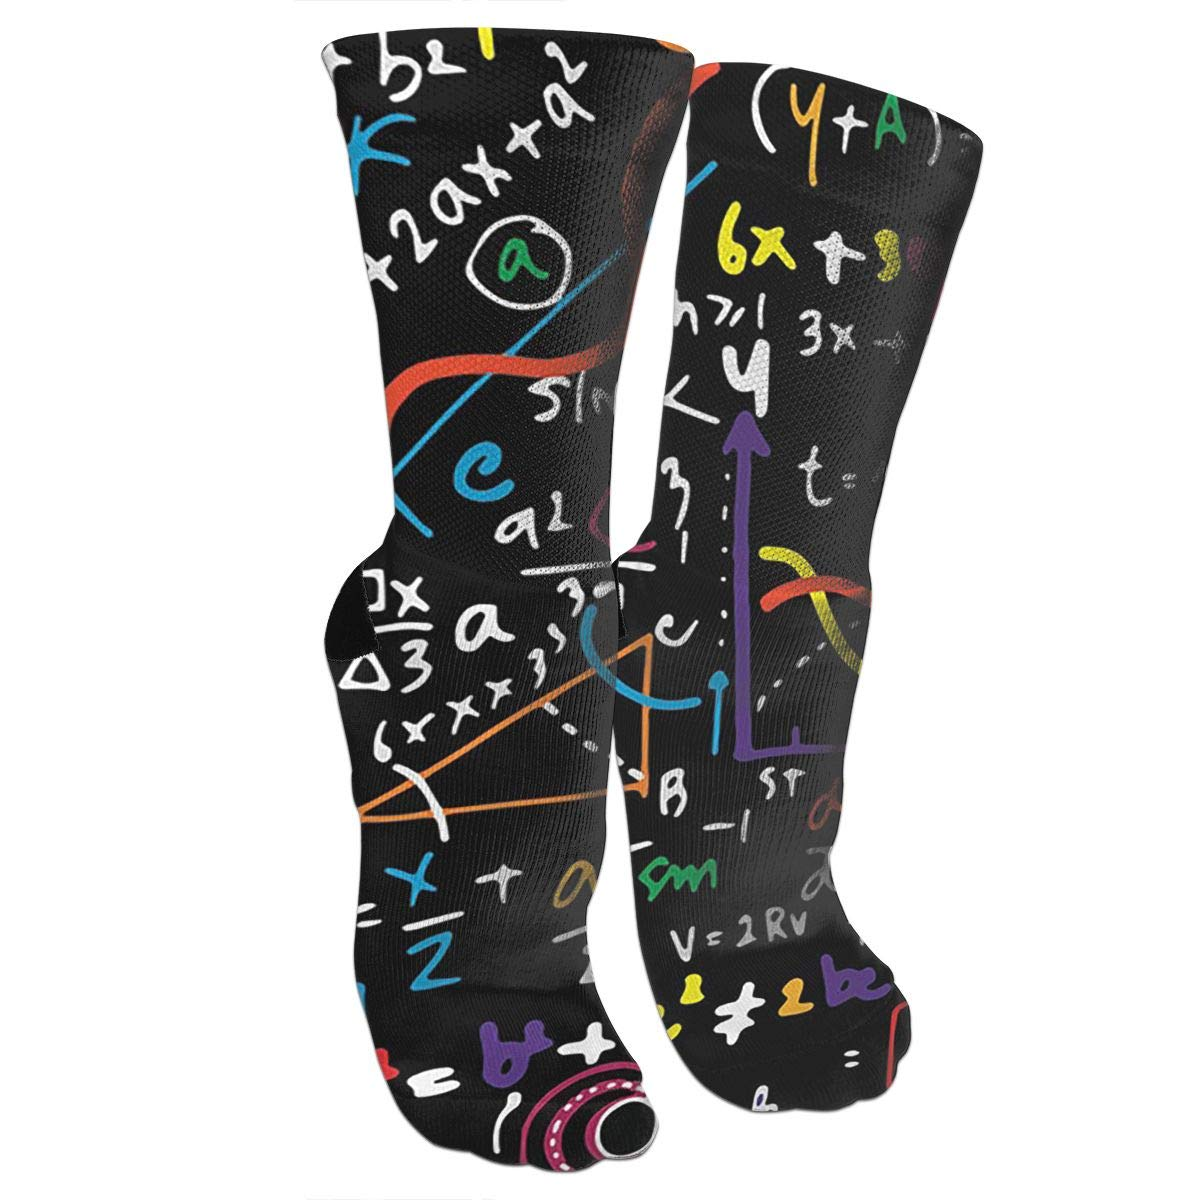 Wellesley Math Crazy Socks Wellesley Math 3D Crew Socks For Running Athletic Sports